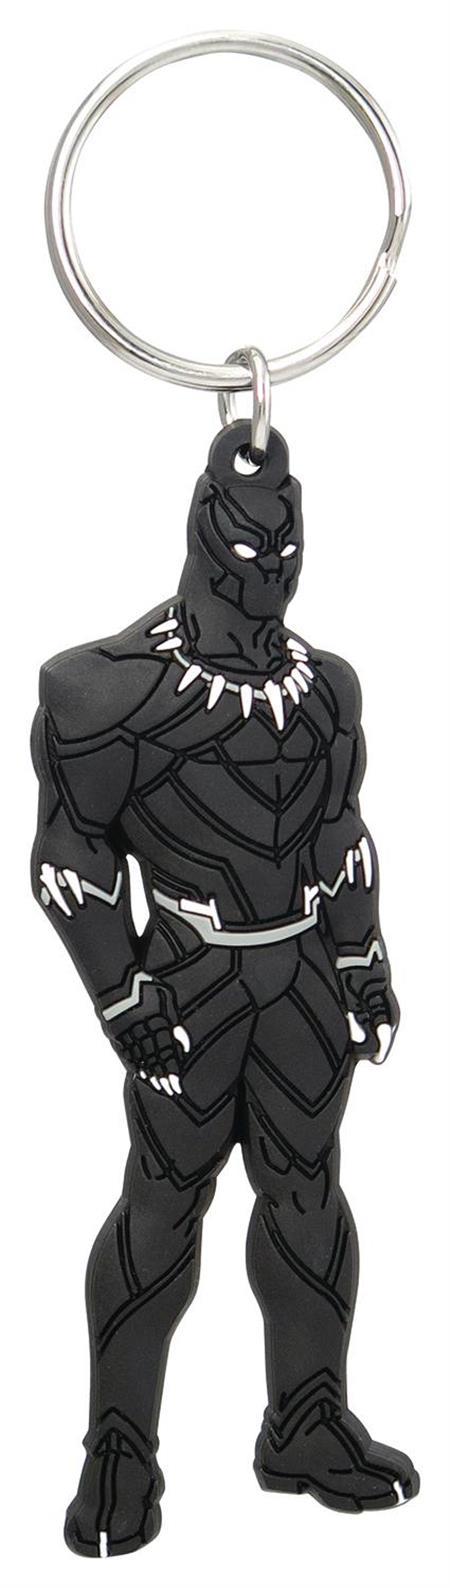 MARVEL BLACK PANTHER SOFT TOUCH PVC KEYRING 6PC BAG (C: 1-0-